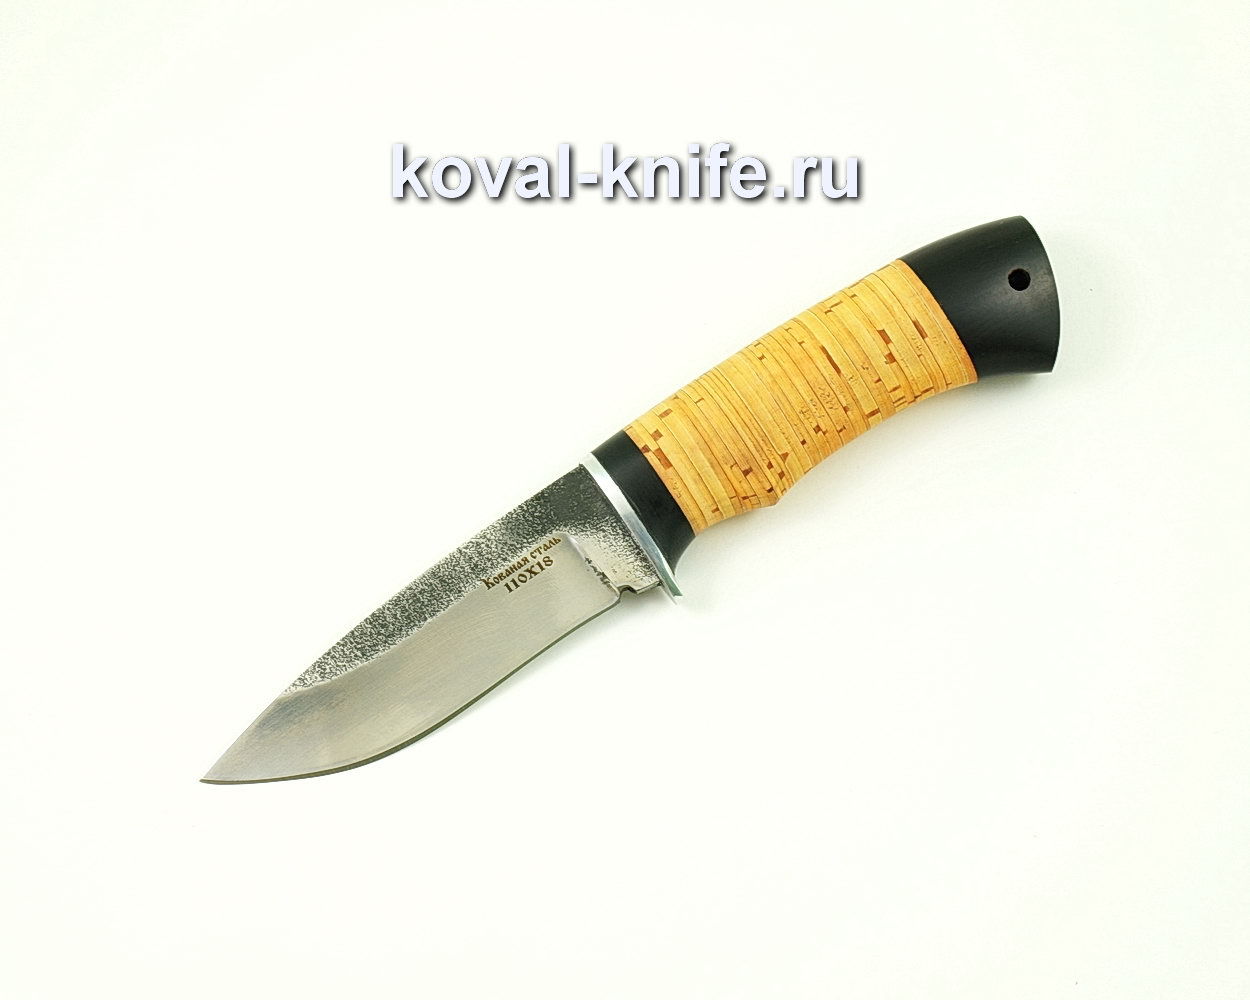 Нож Сапсан из стали 110х18 (рукоять береста, граб) A412